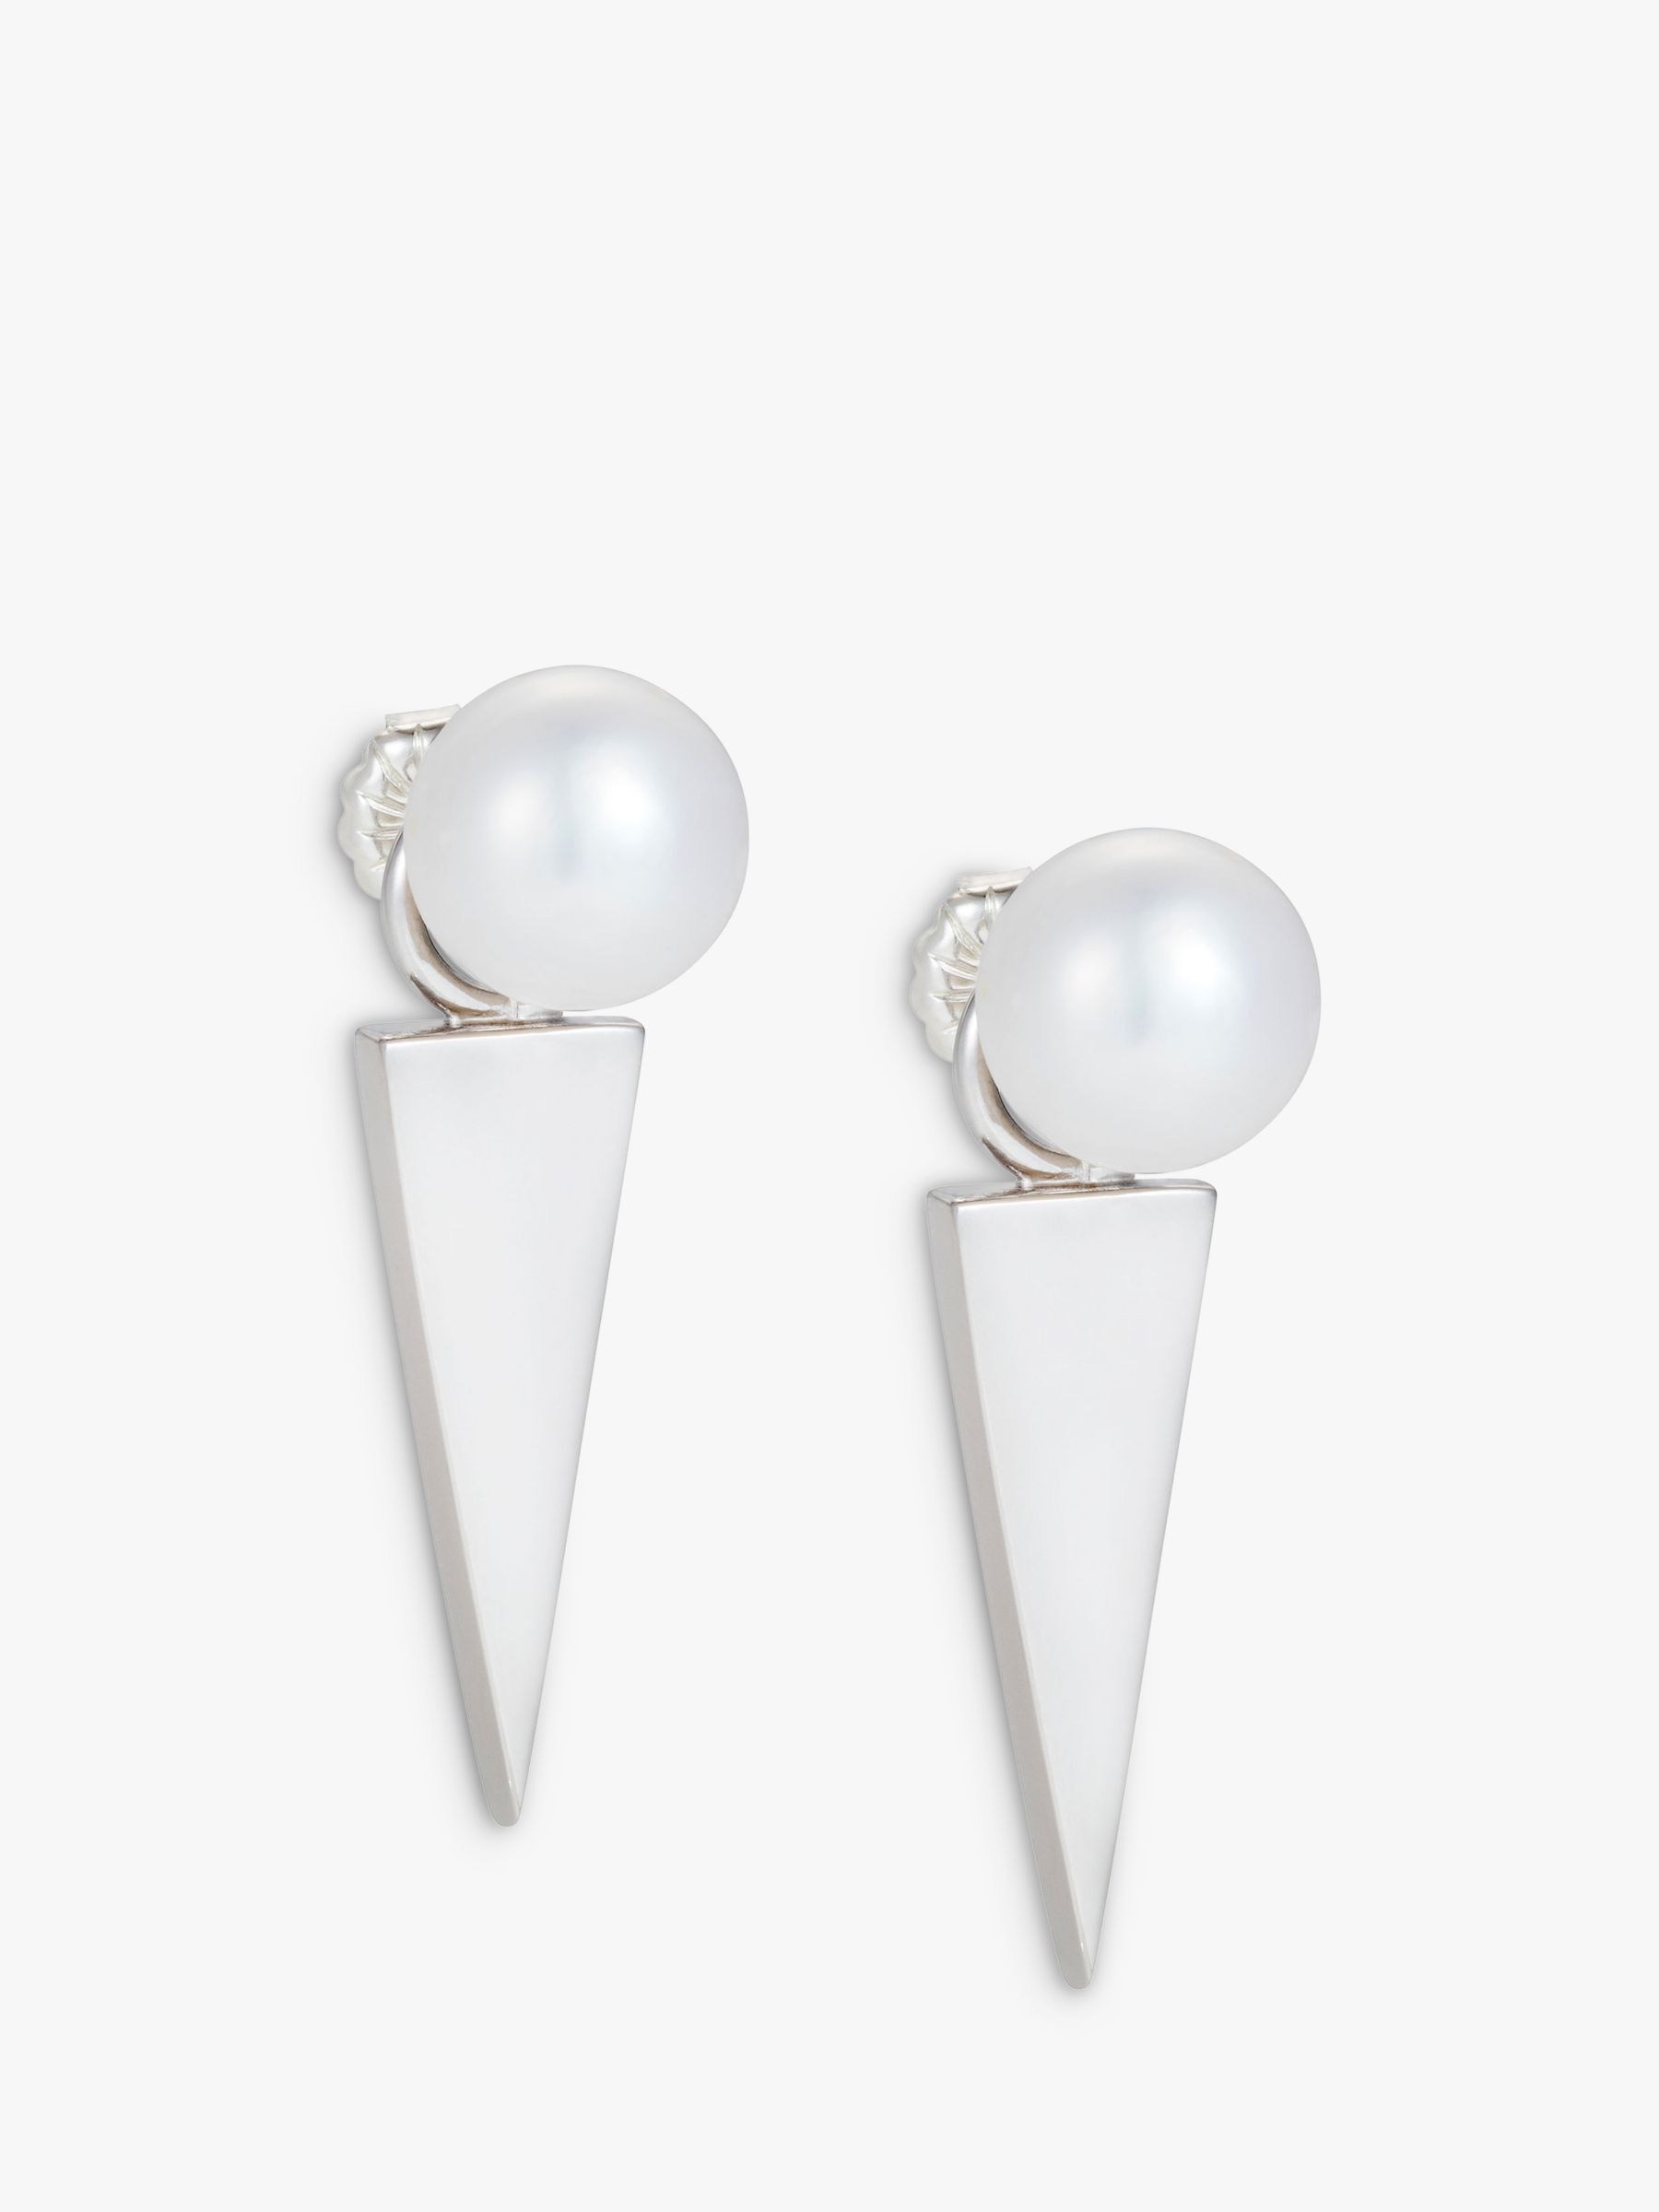 Claudia Bradby Claudia Bradby Freshwater Pearl Geometric Blade Drop Earrings, Silver/White